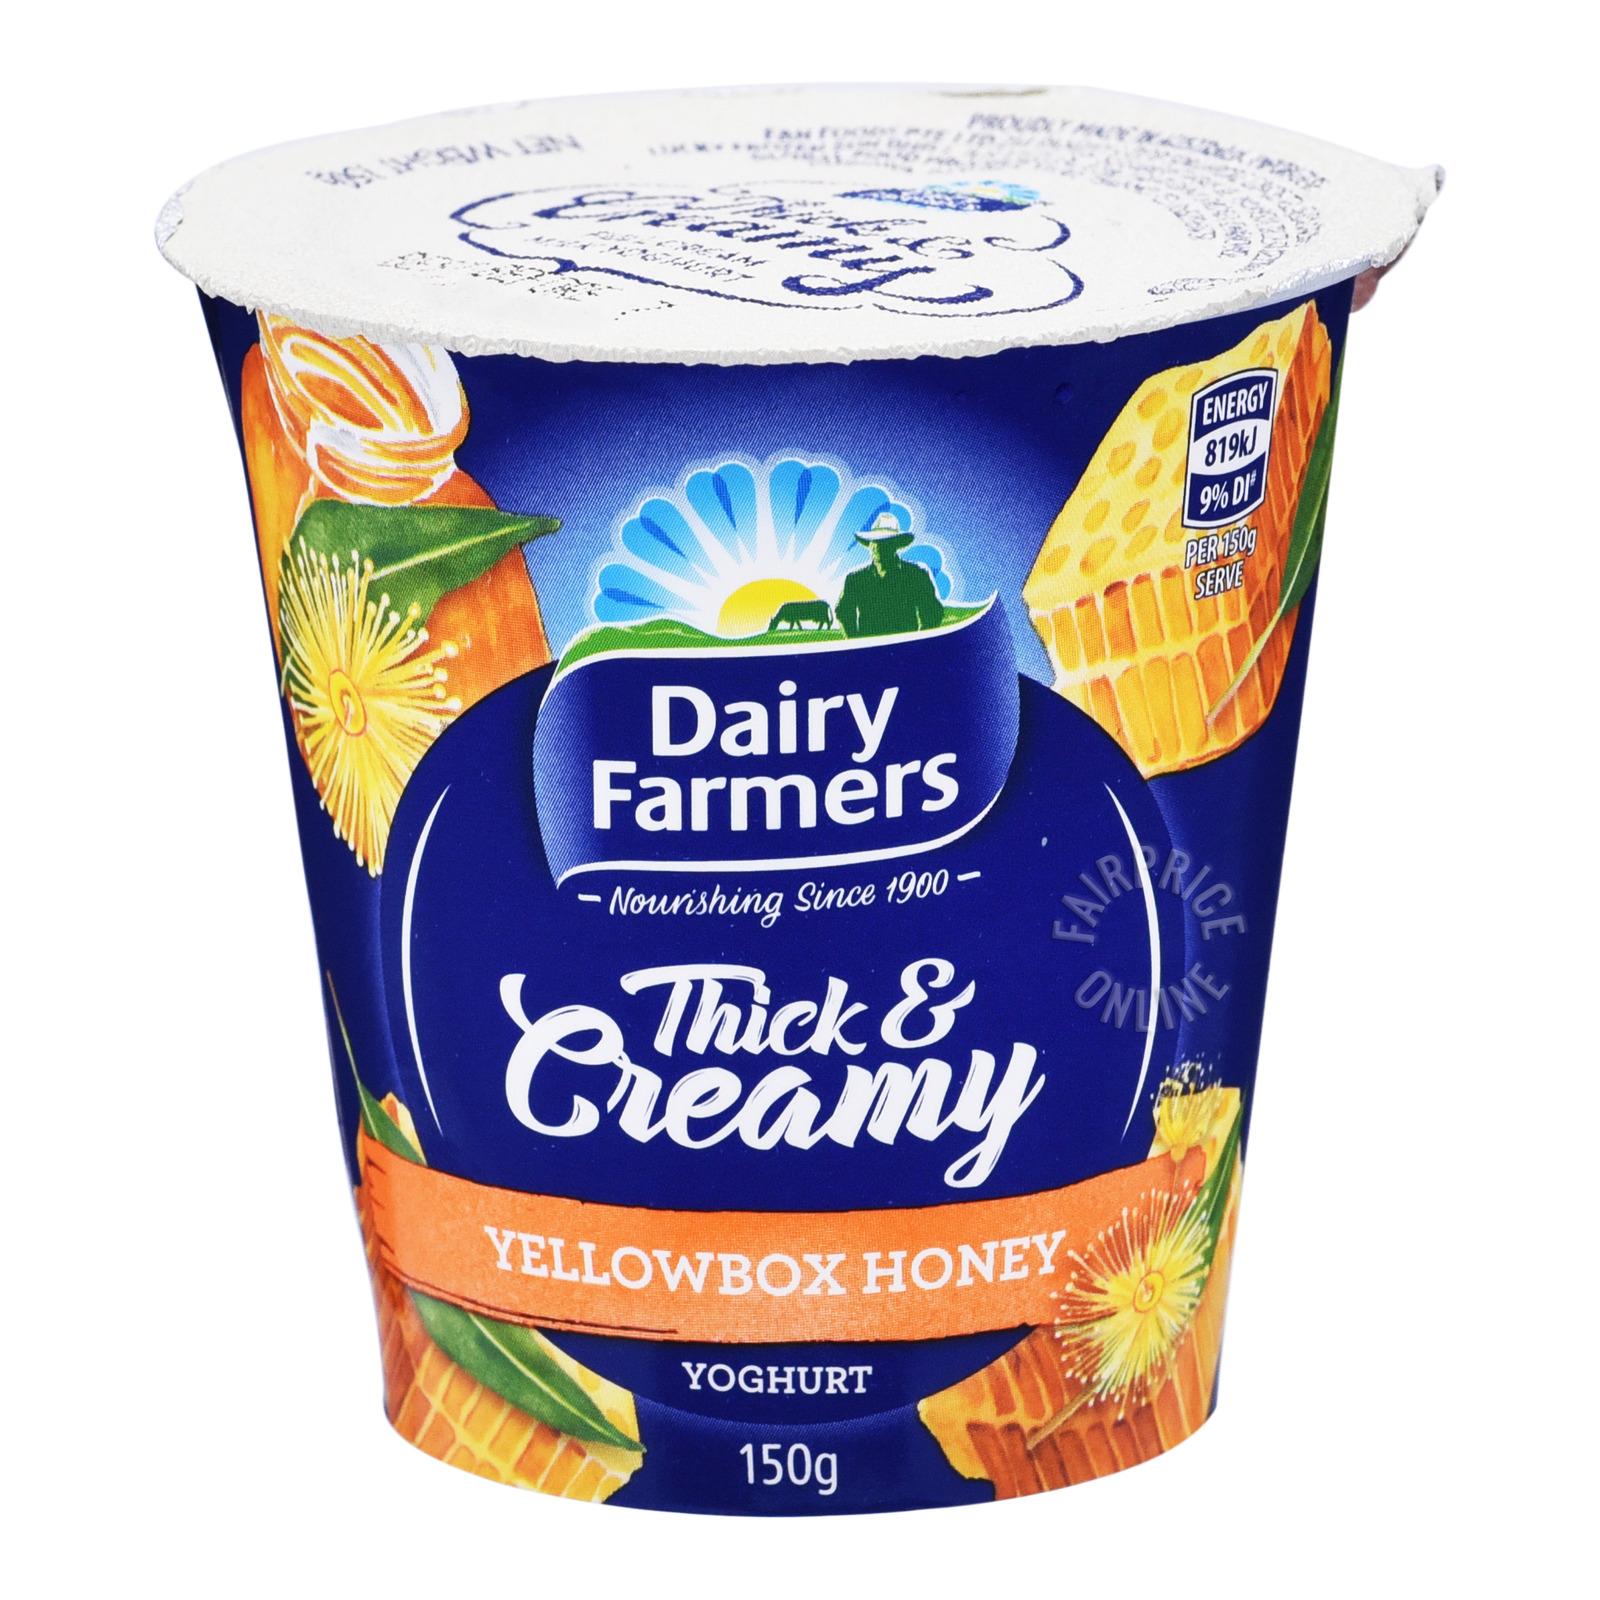 Dairy Farmers Thick & Creamy Yoghurt - Yellow Box Honey